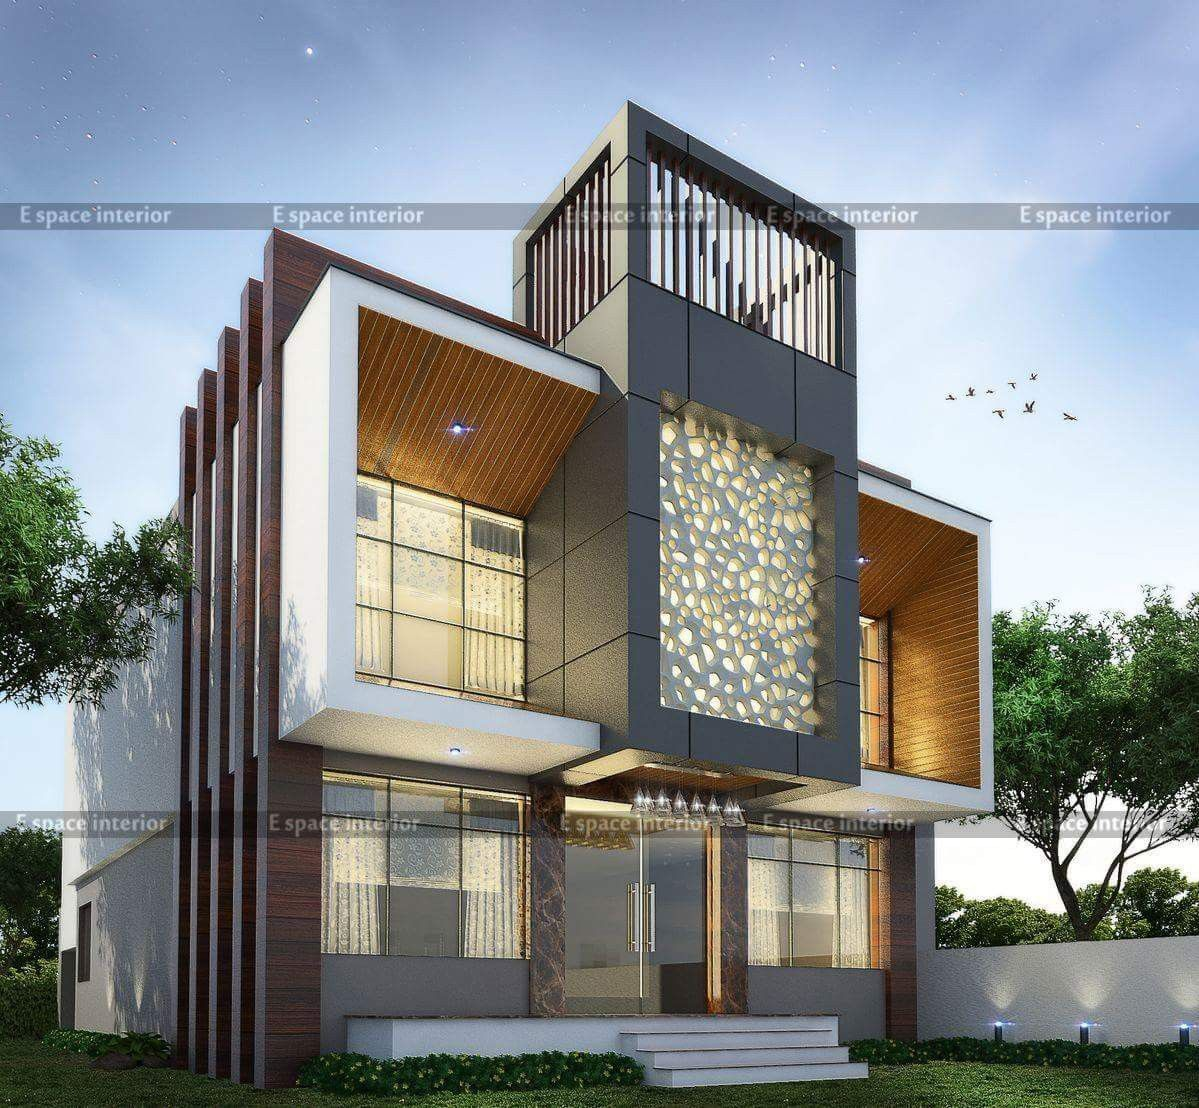 Building elevation house elevation front elevation small house design modern house design